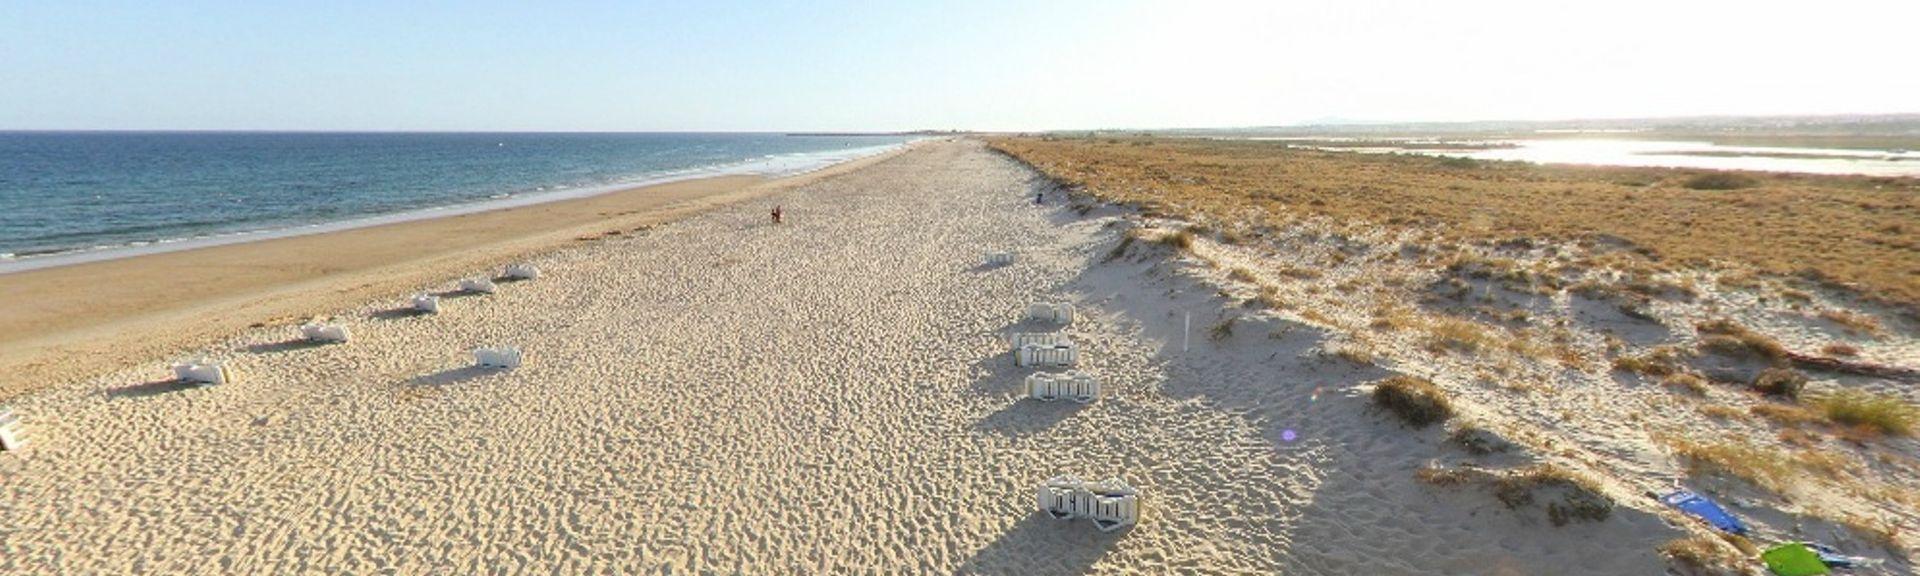 Verde Beach, Castro Marim, Algarve, Portugal